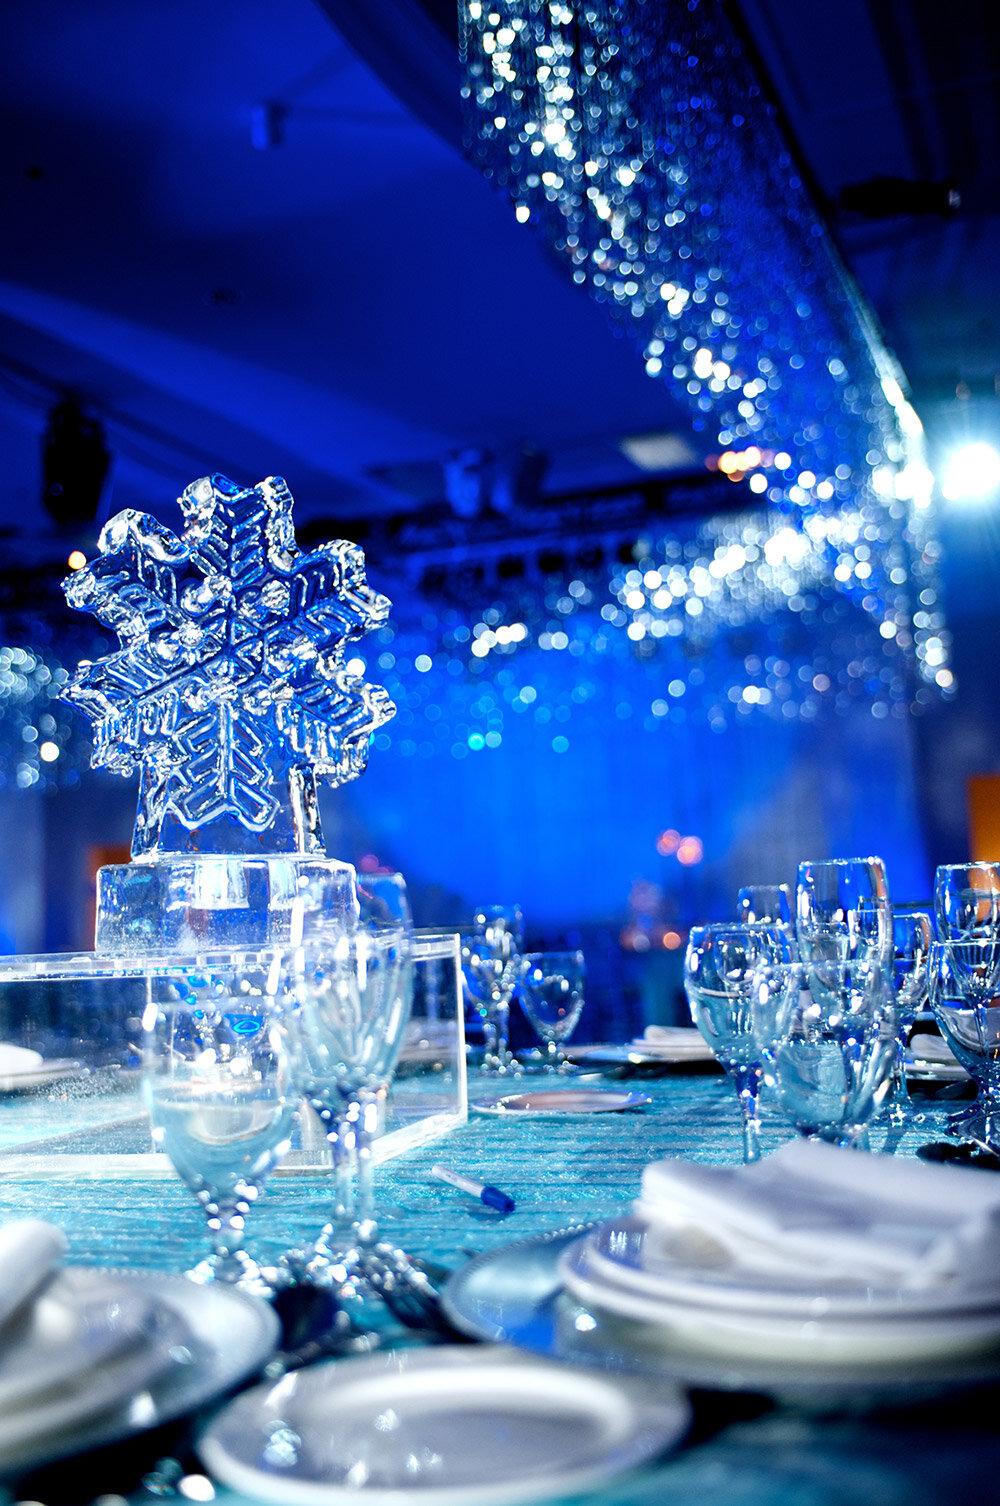 Paras-Events-Gala-Design-Ice-Winter-Wonderland-Party-Trillium-Health-Partners-Foundation-2.jpg